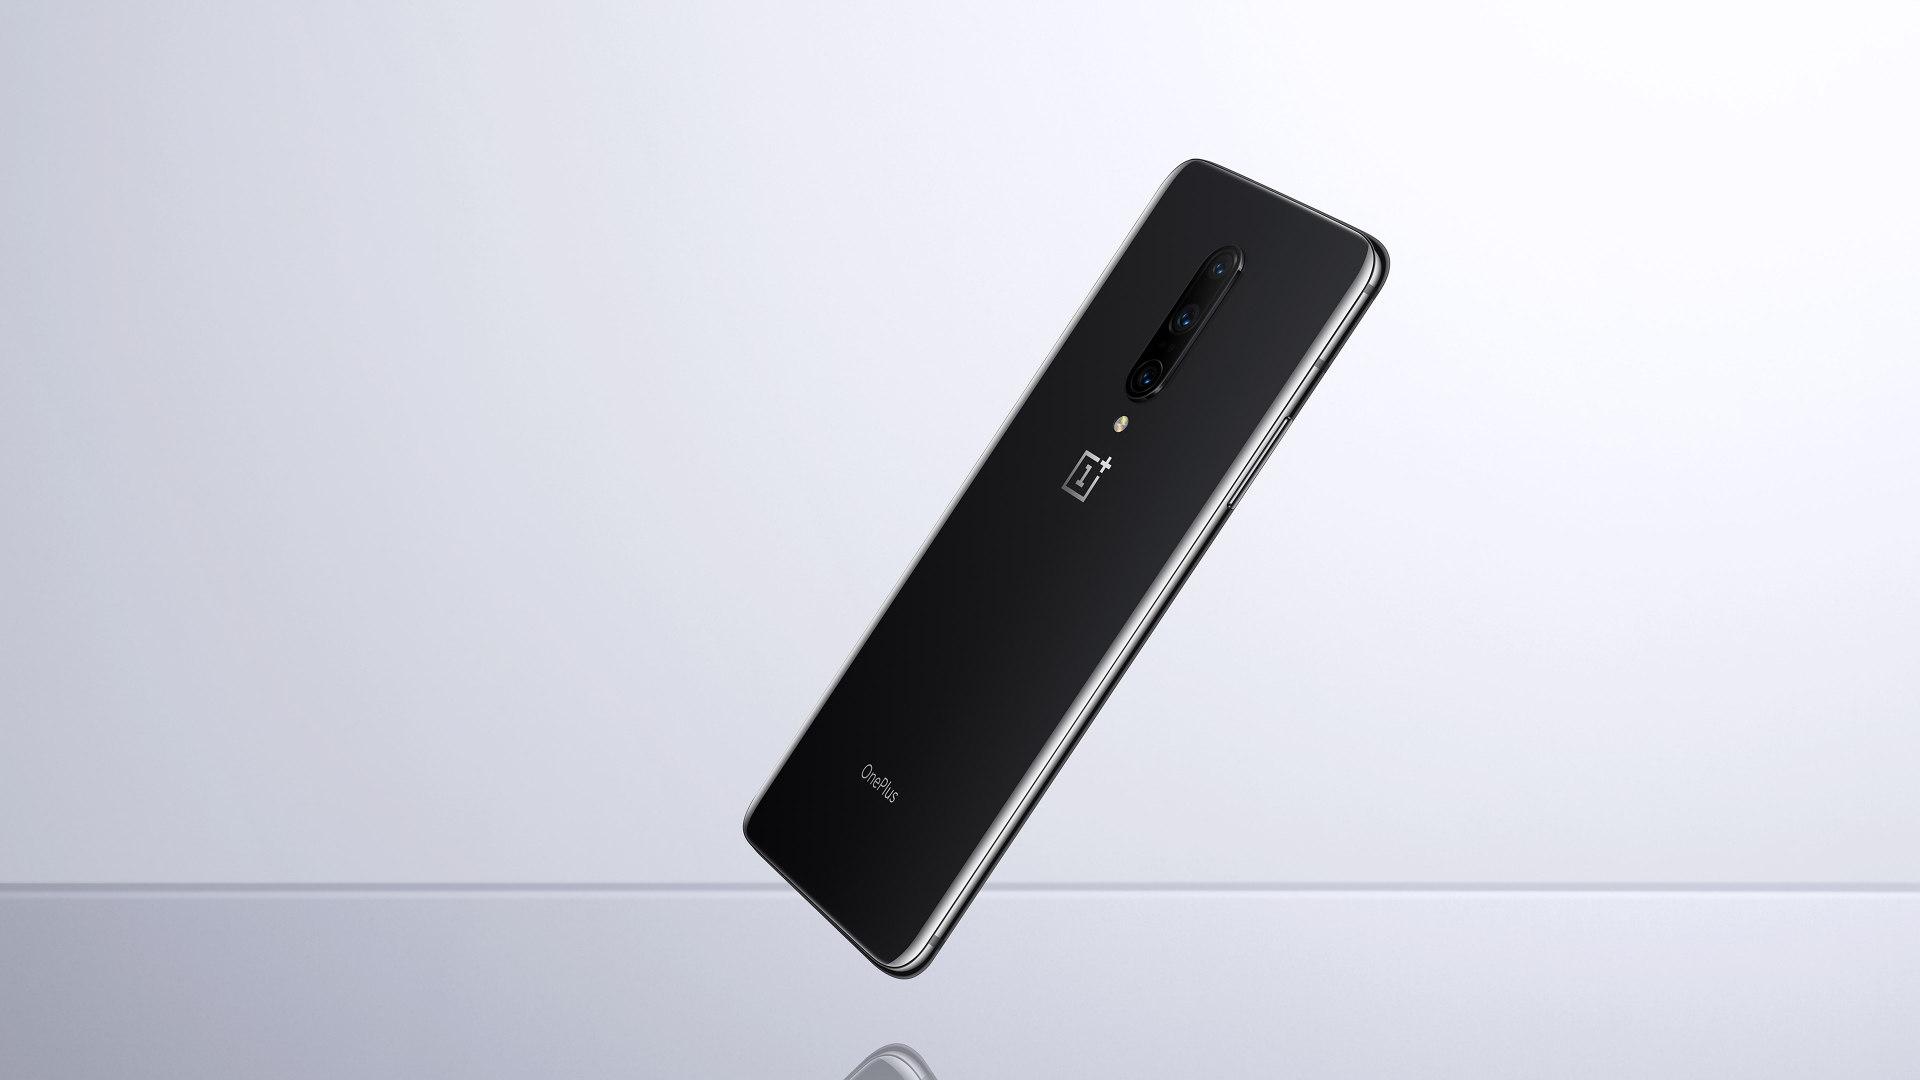 Buy OnePlus 7 Pro - OnePlus (Canada)